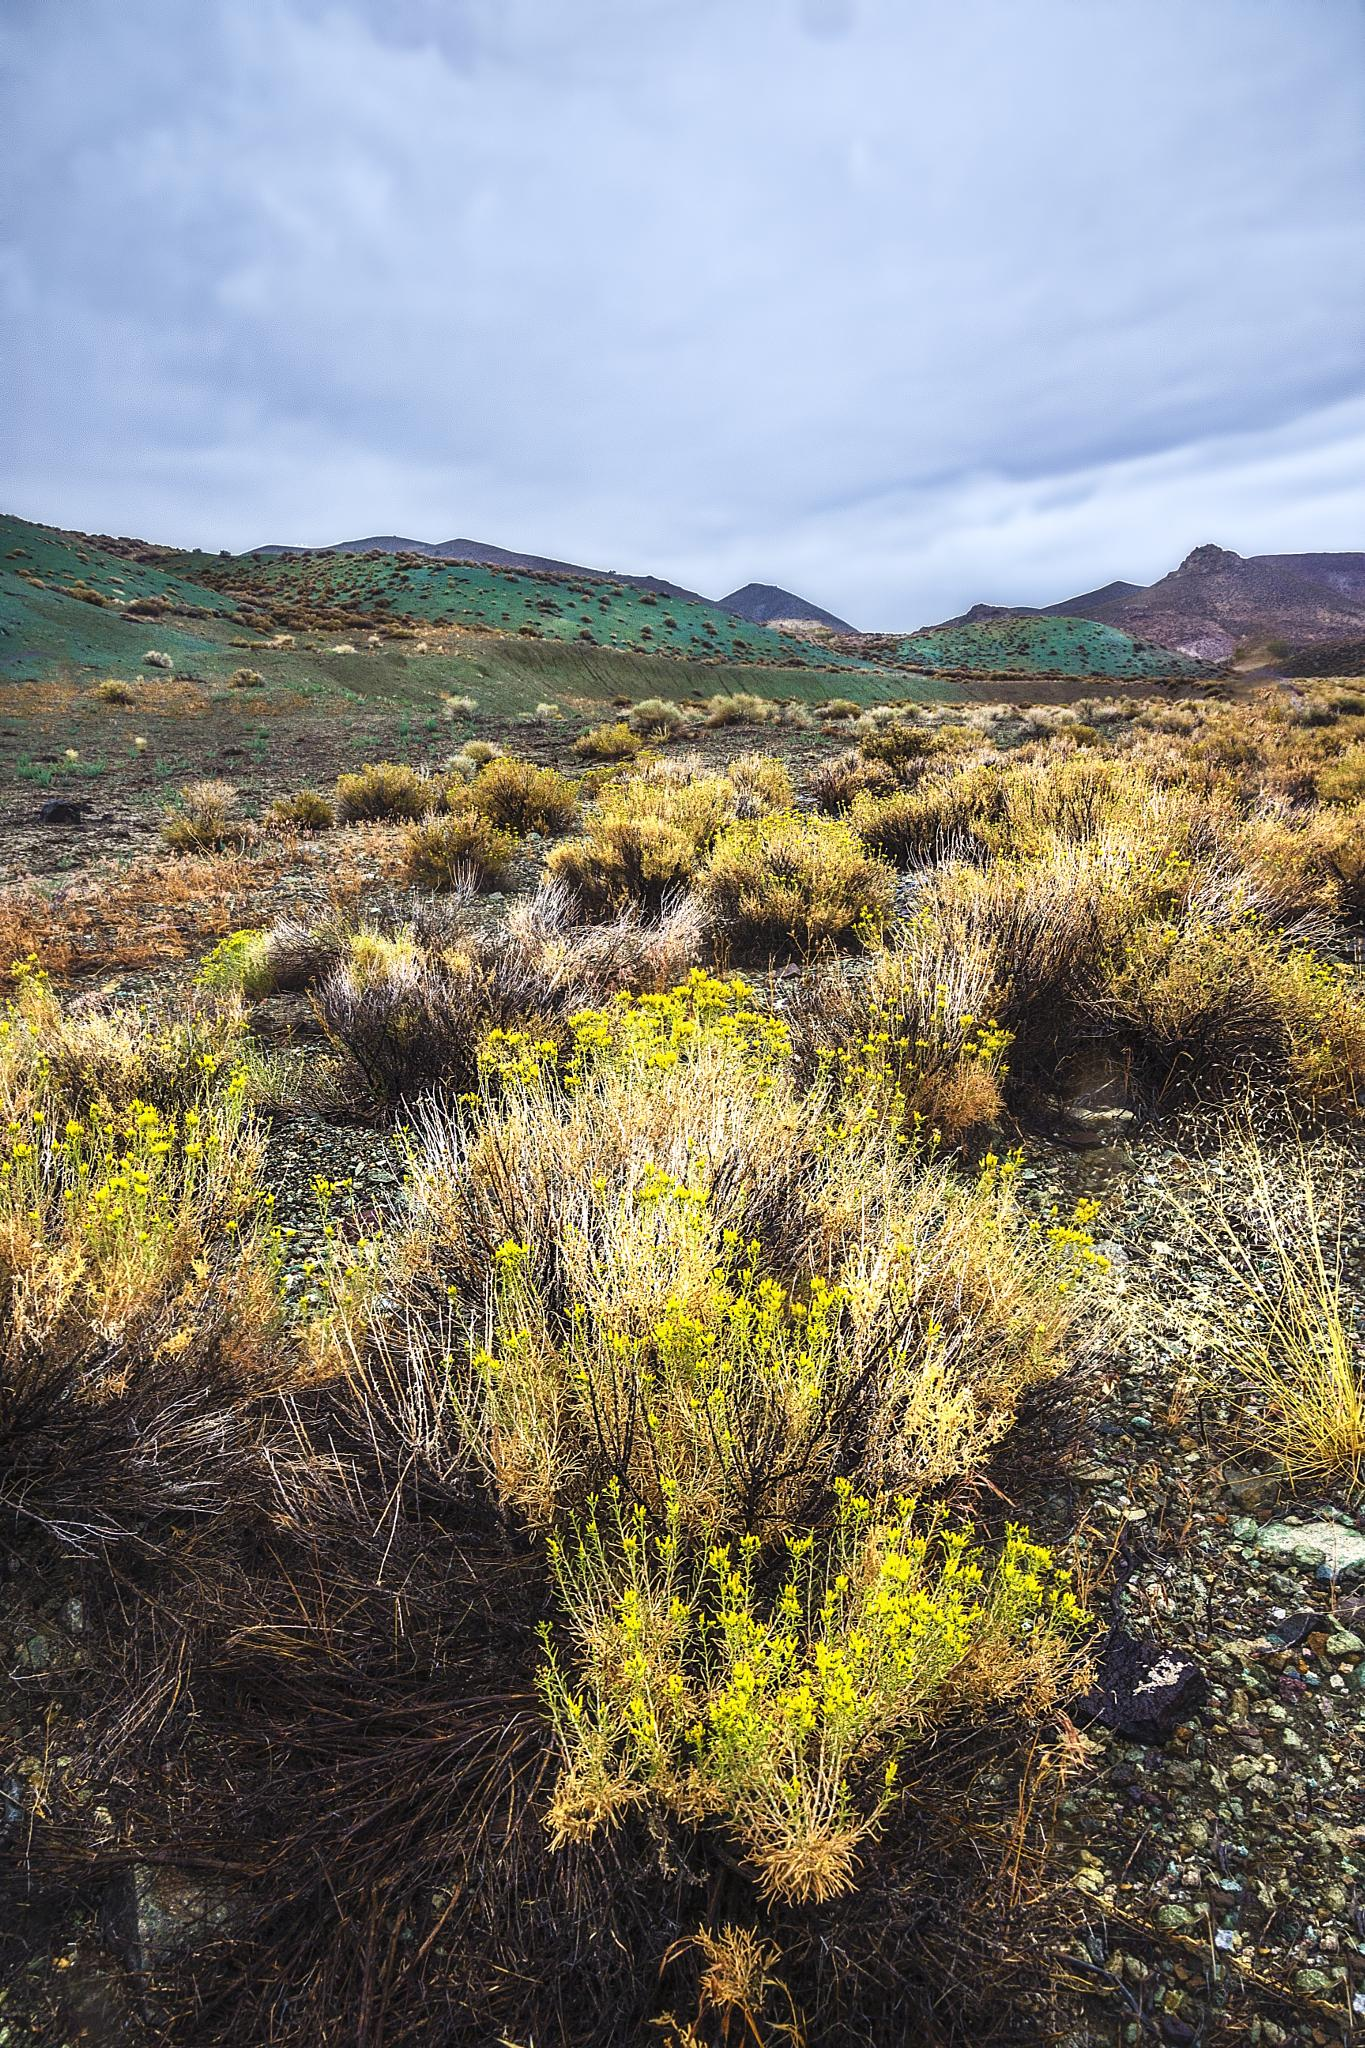 Northern Nevada by Ed Stilwell